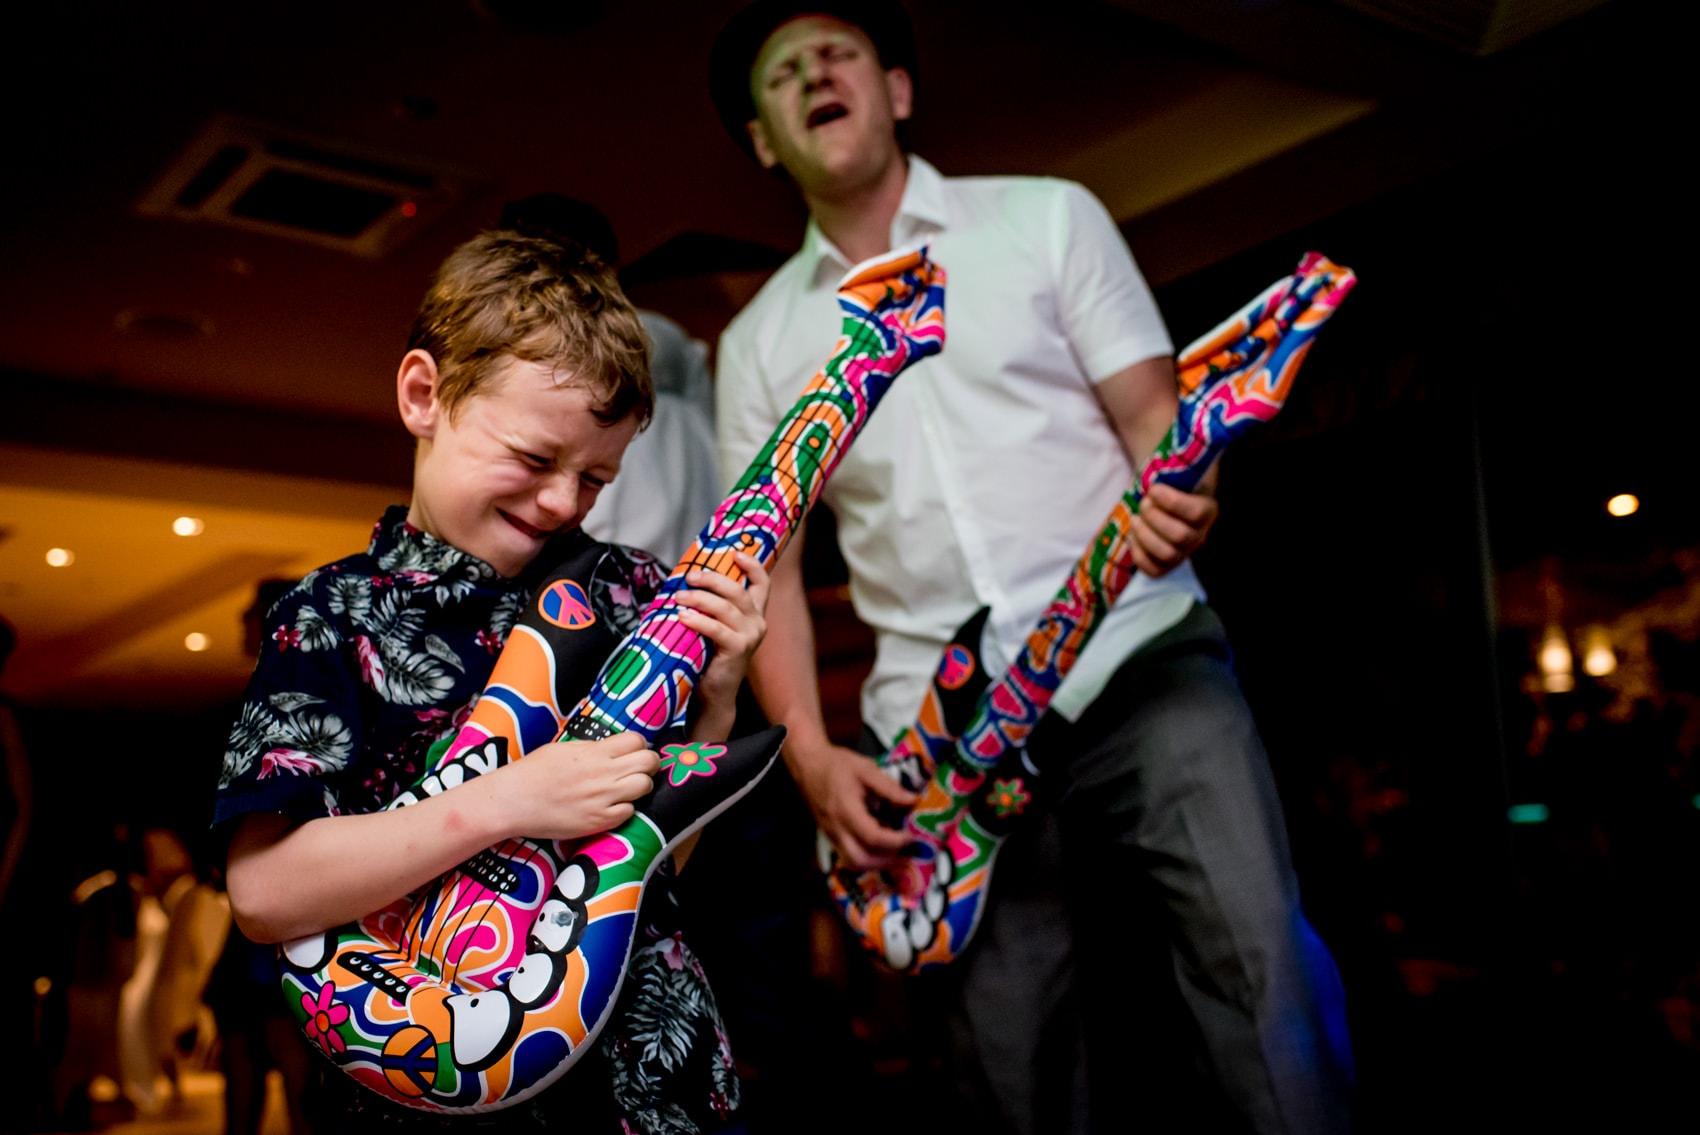 rock and roll wedding dancefloor with air guitars